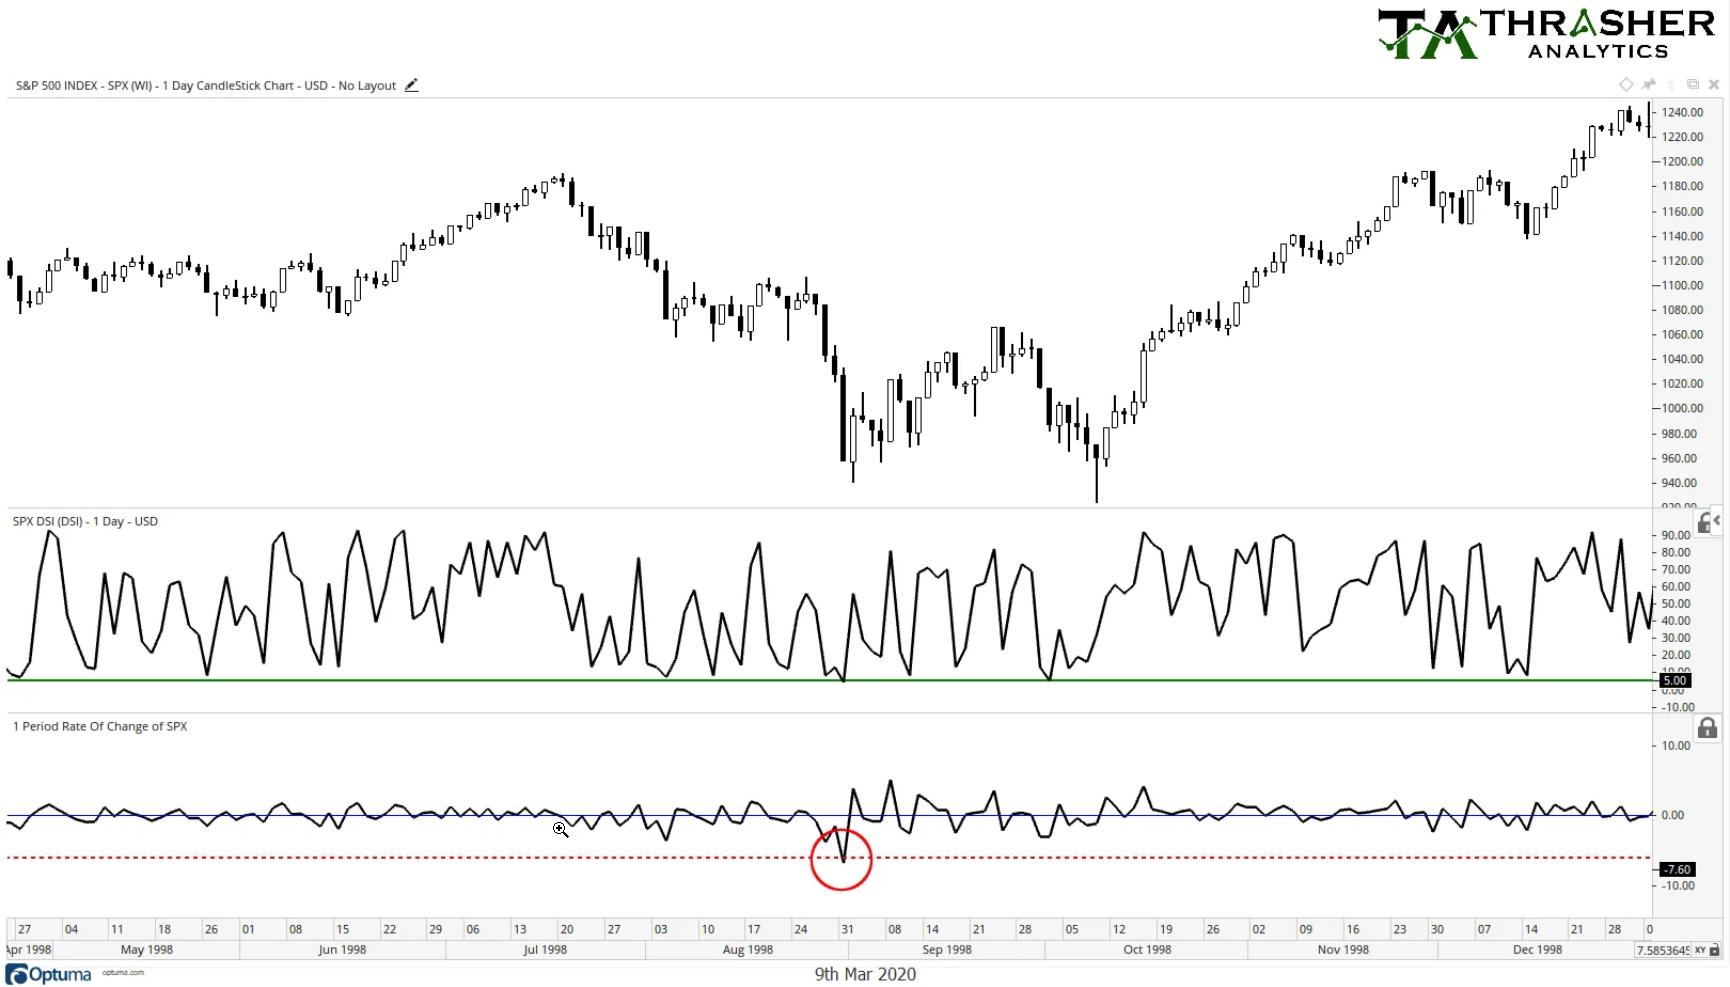 S&P 500: 1998